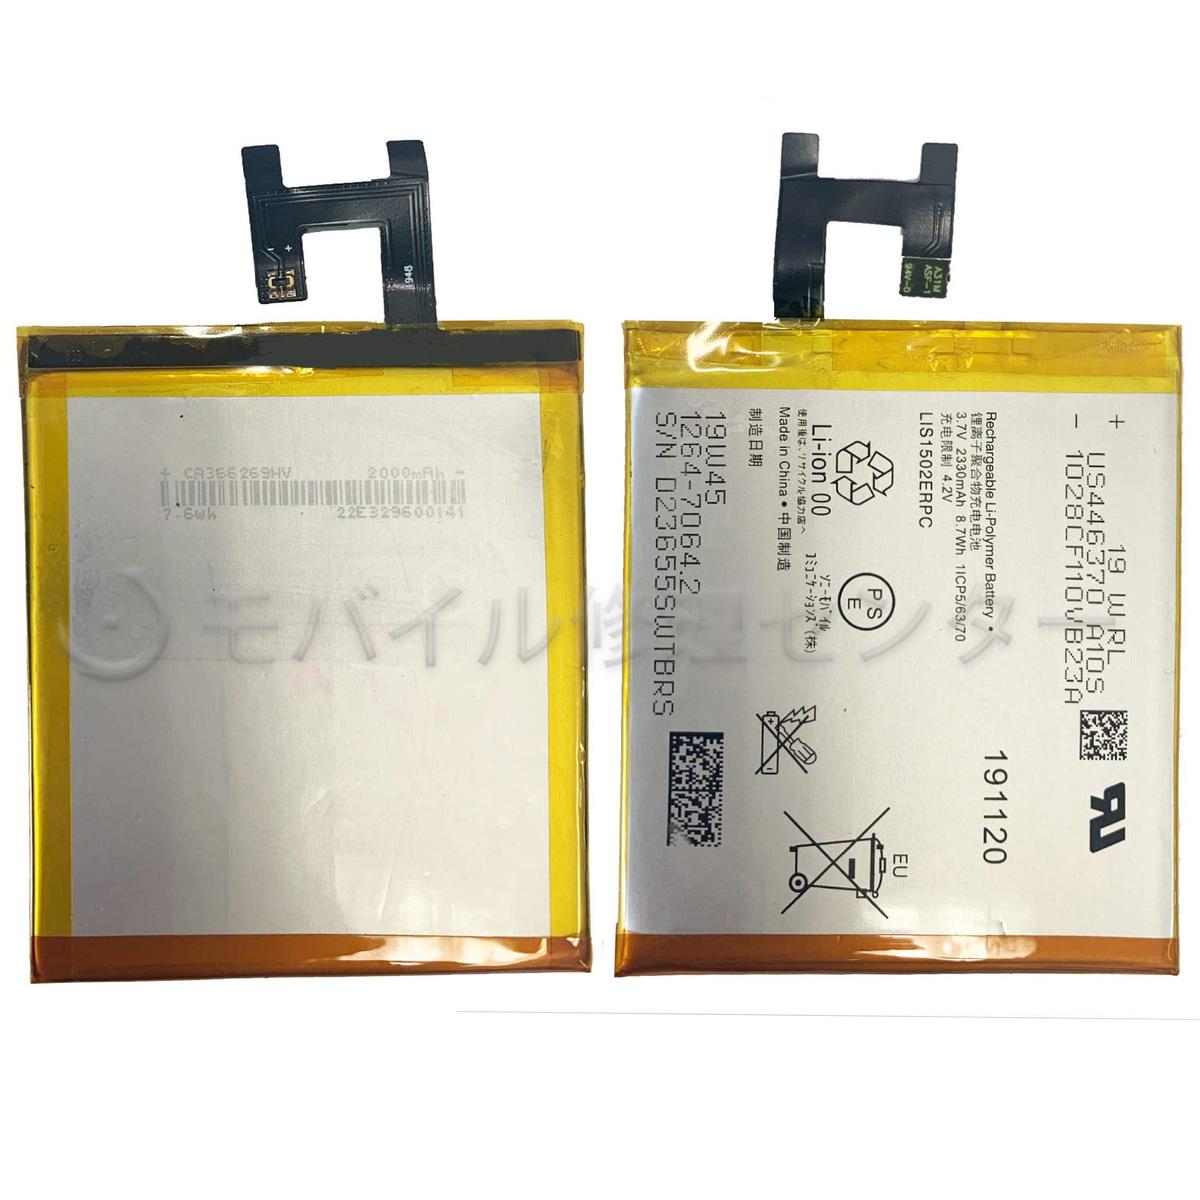 Sony 送料無料 激安 お買い得 キ゛フト Xperia エクスペリア Z SO-02E C6603 C6602 L36H 交換バッテリー 業者向け お買い得 バッテリー 交換用バッテリー Zバッテリー 経験者向け LIS1502ERPC ソニーエクスペリア